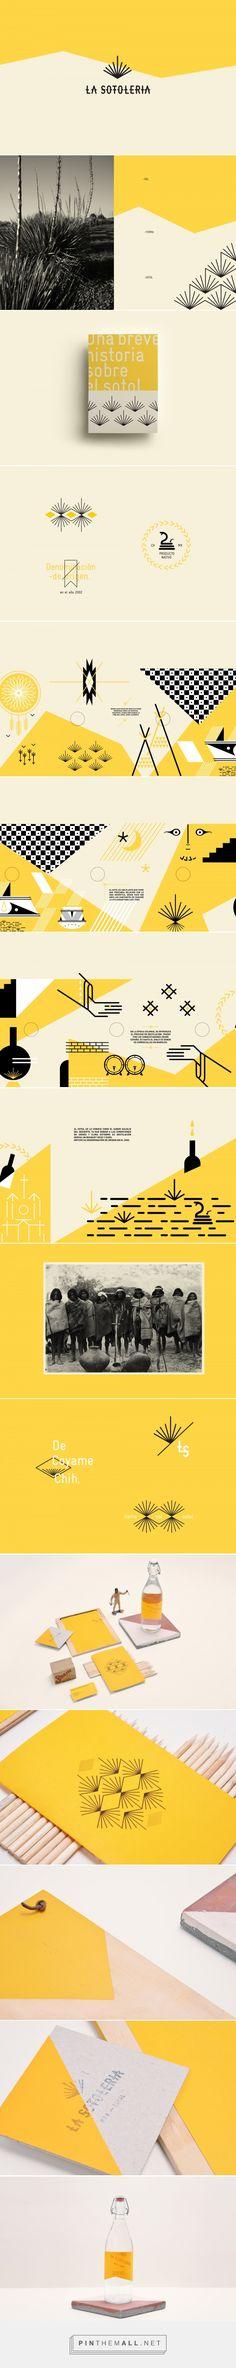 La Sotolería Bar Branding by Estudio Yeyé® | Fivestar Branding Agency – Design and Branding Agency & Inspiration Gallery Graphic Design Branding, Graphic Design Illustration, Hipster Graphic Design, Graphic Design Pattern, Print Design, Brand Identity Design, Type Logo, Corporate Branding, Logo Branding